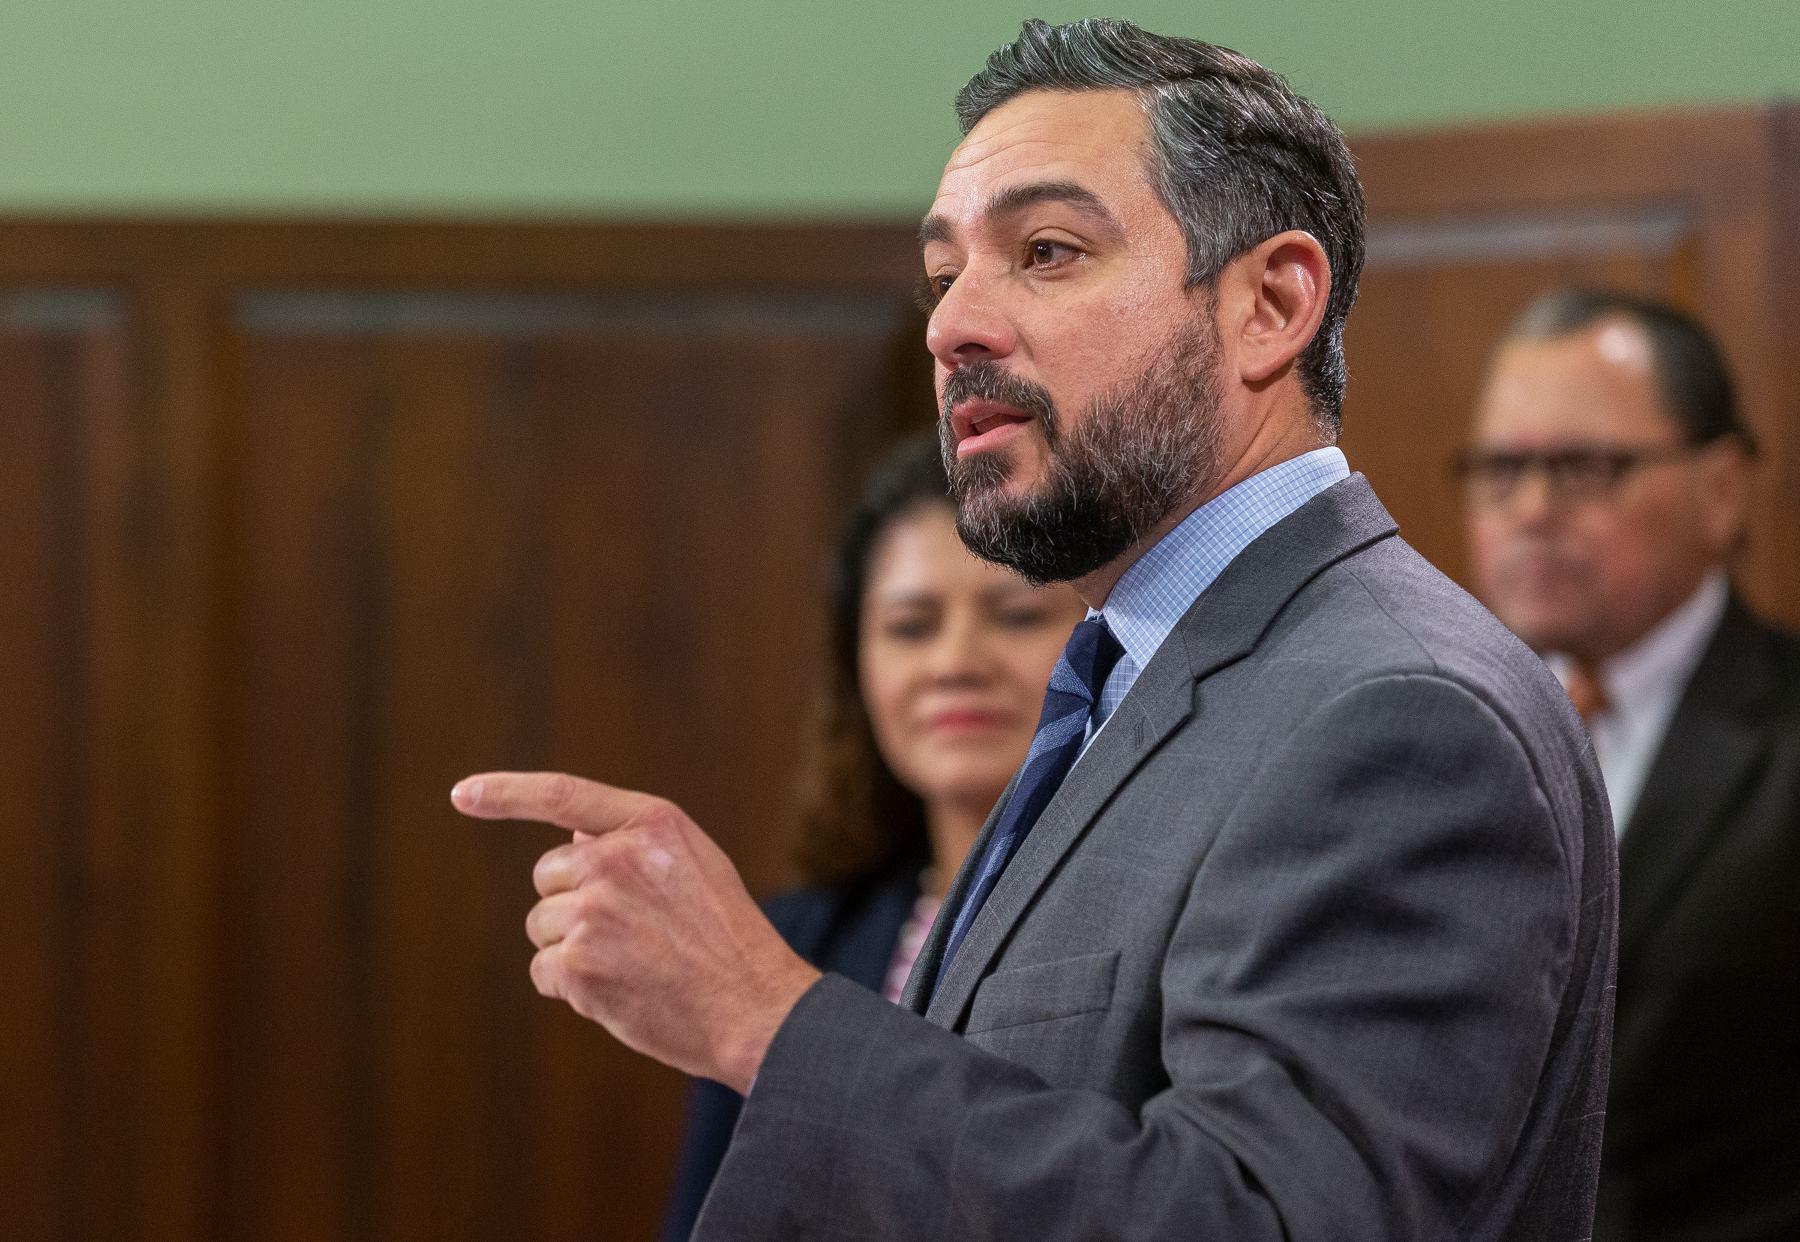 State Rep. César Blanco speaks during a press conference in Austin, Texas (Stephen Spillman/Austin American-Statesman).